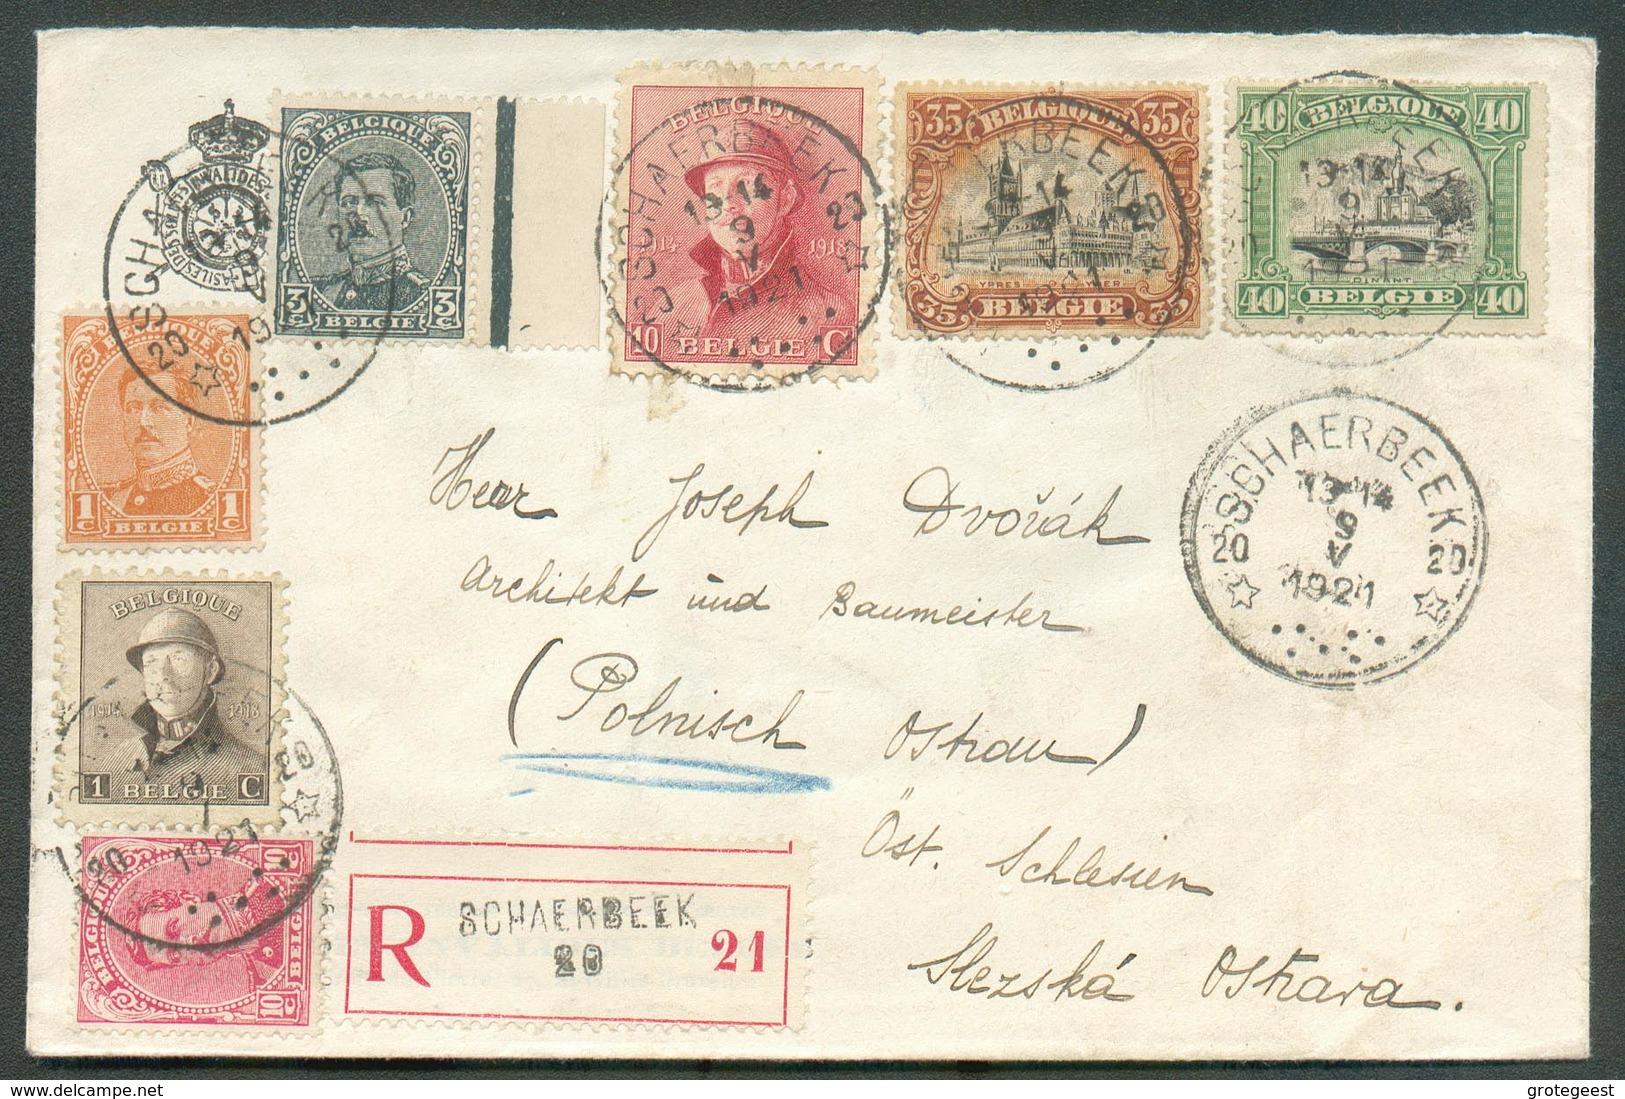 N°135-138-142-143-165-168-183 - Affr. Combiné Em. 1915/ROIS CASQUES à 1Fr. (port Exact) Obl. Sc Agence De SCHAERBEEK 20 - Postmark Collection